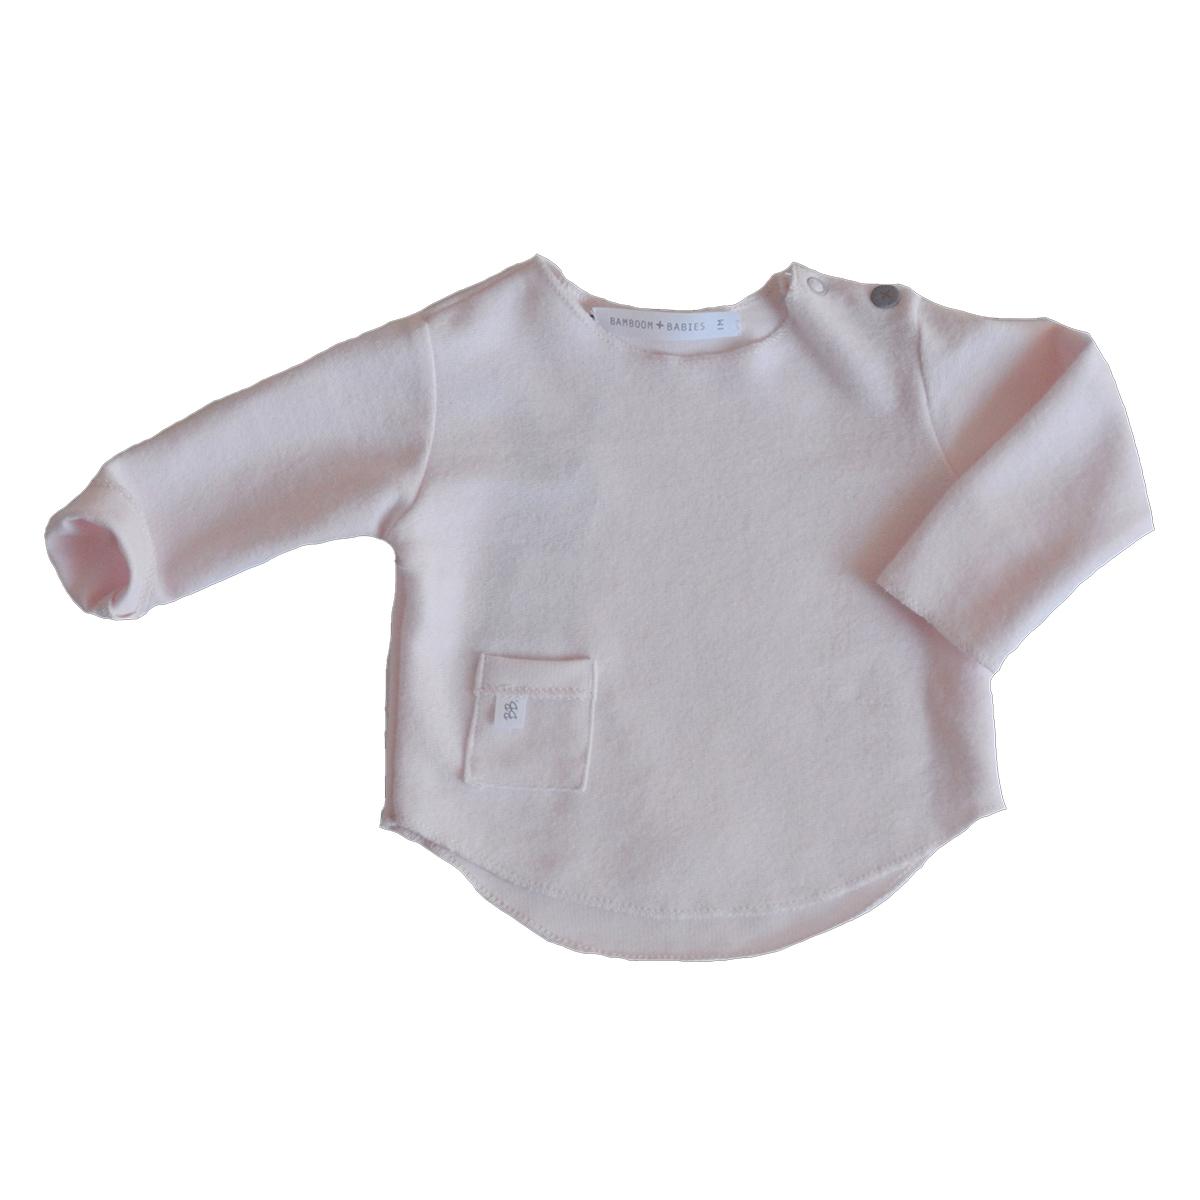 Haut bébé Tee-Shirt Manches Longues Rose - 9/12 Mois Tee-Shirt Manches Longues Rose - 9/12 Mois